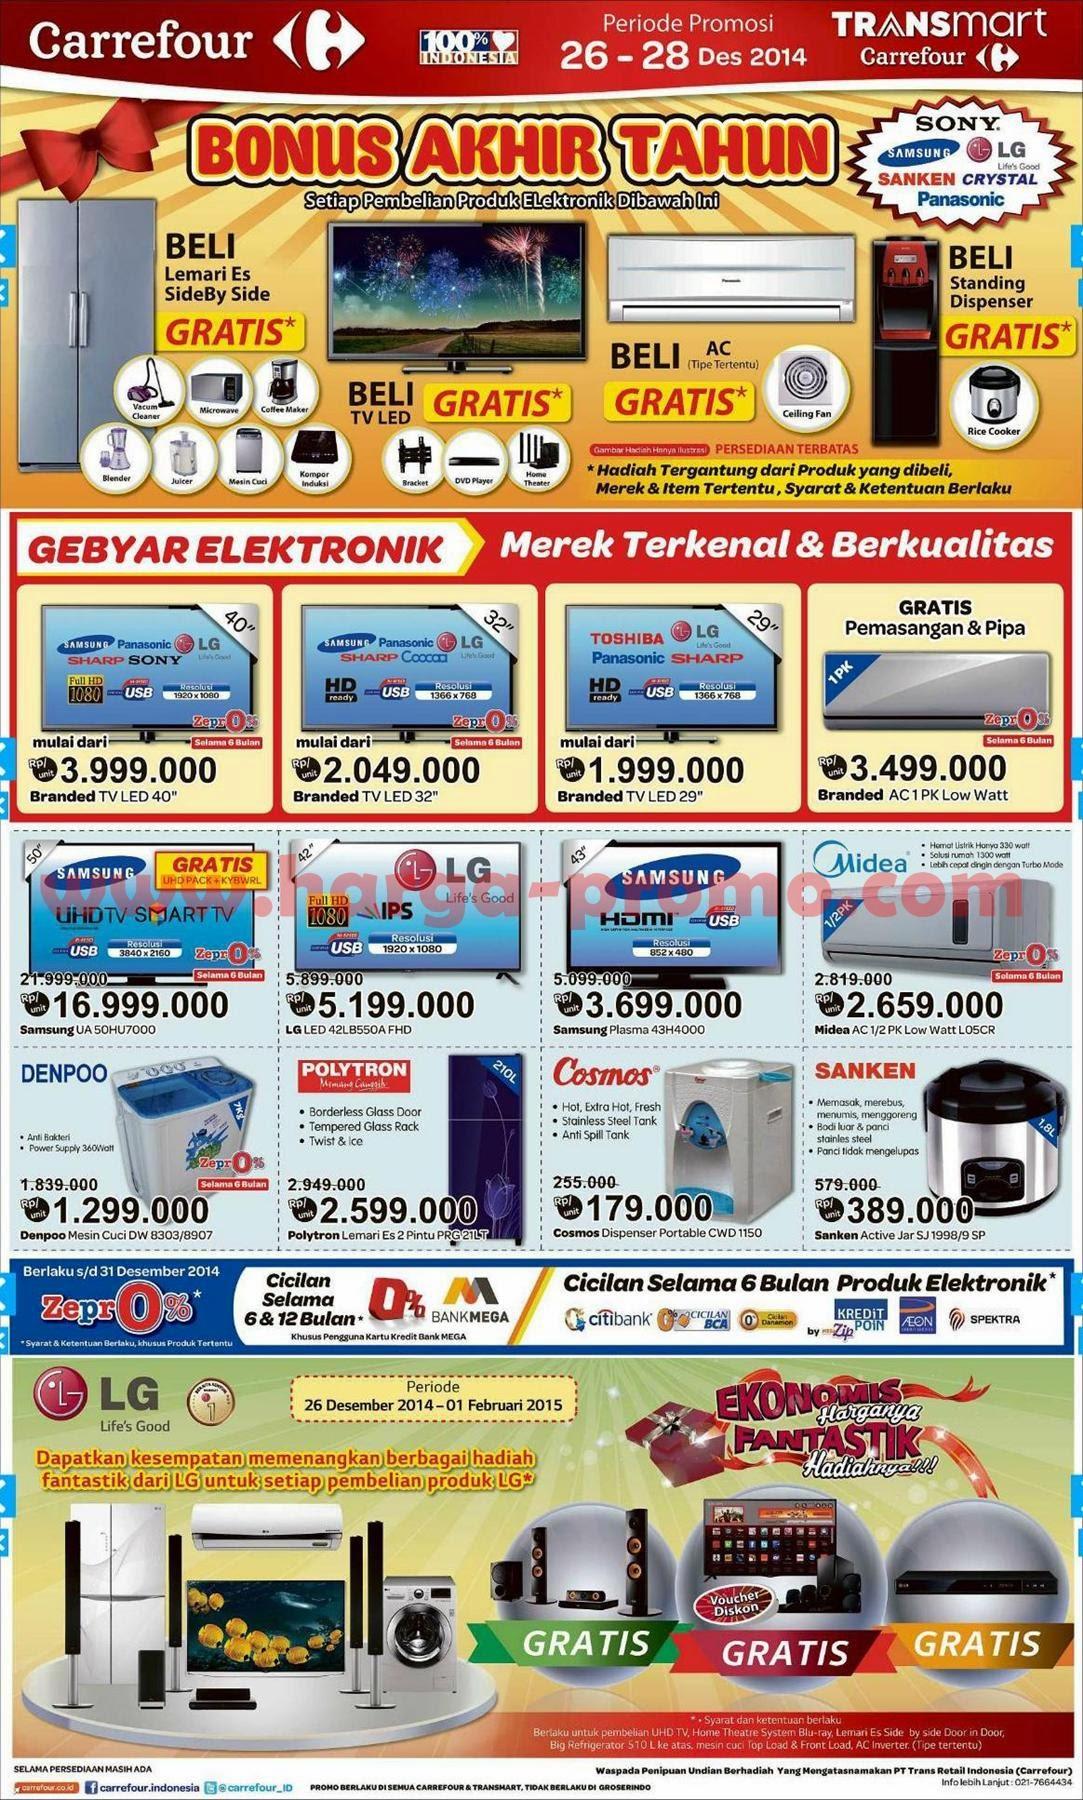 Promosi carrefour akhir pekan electronic fair periode 26 - 28 desember